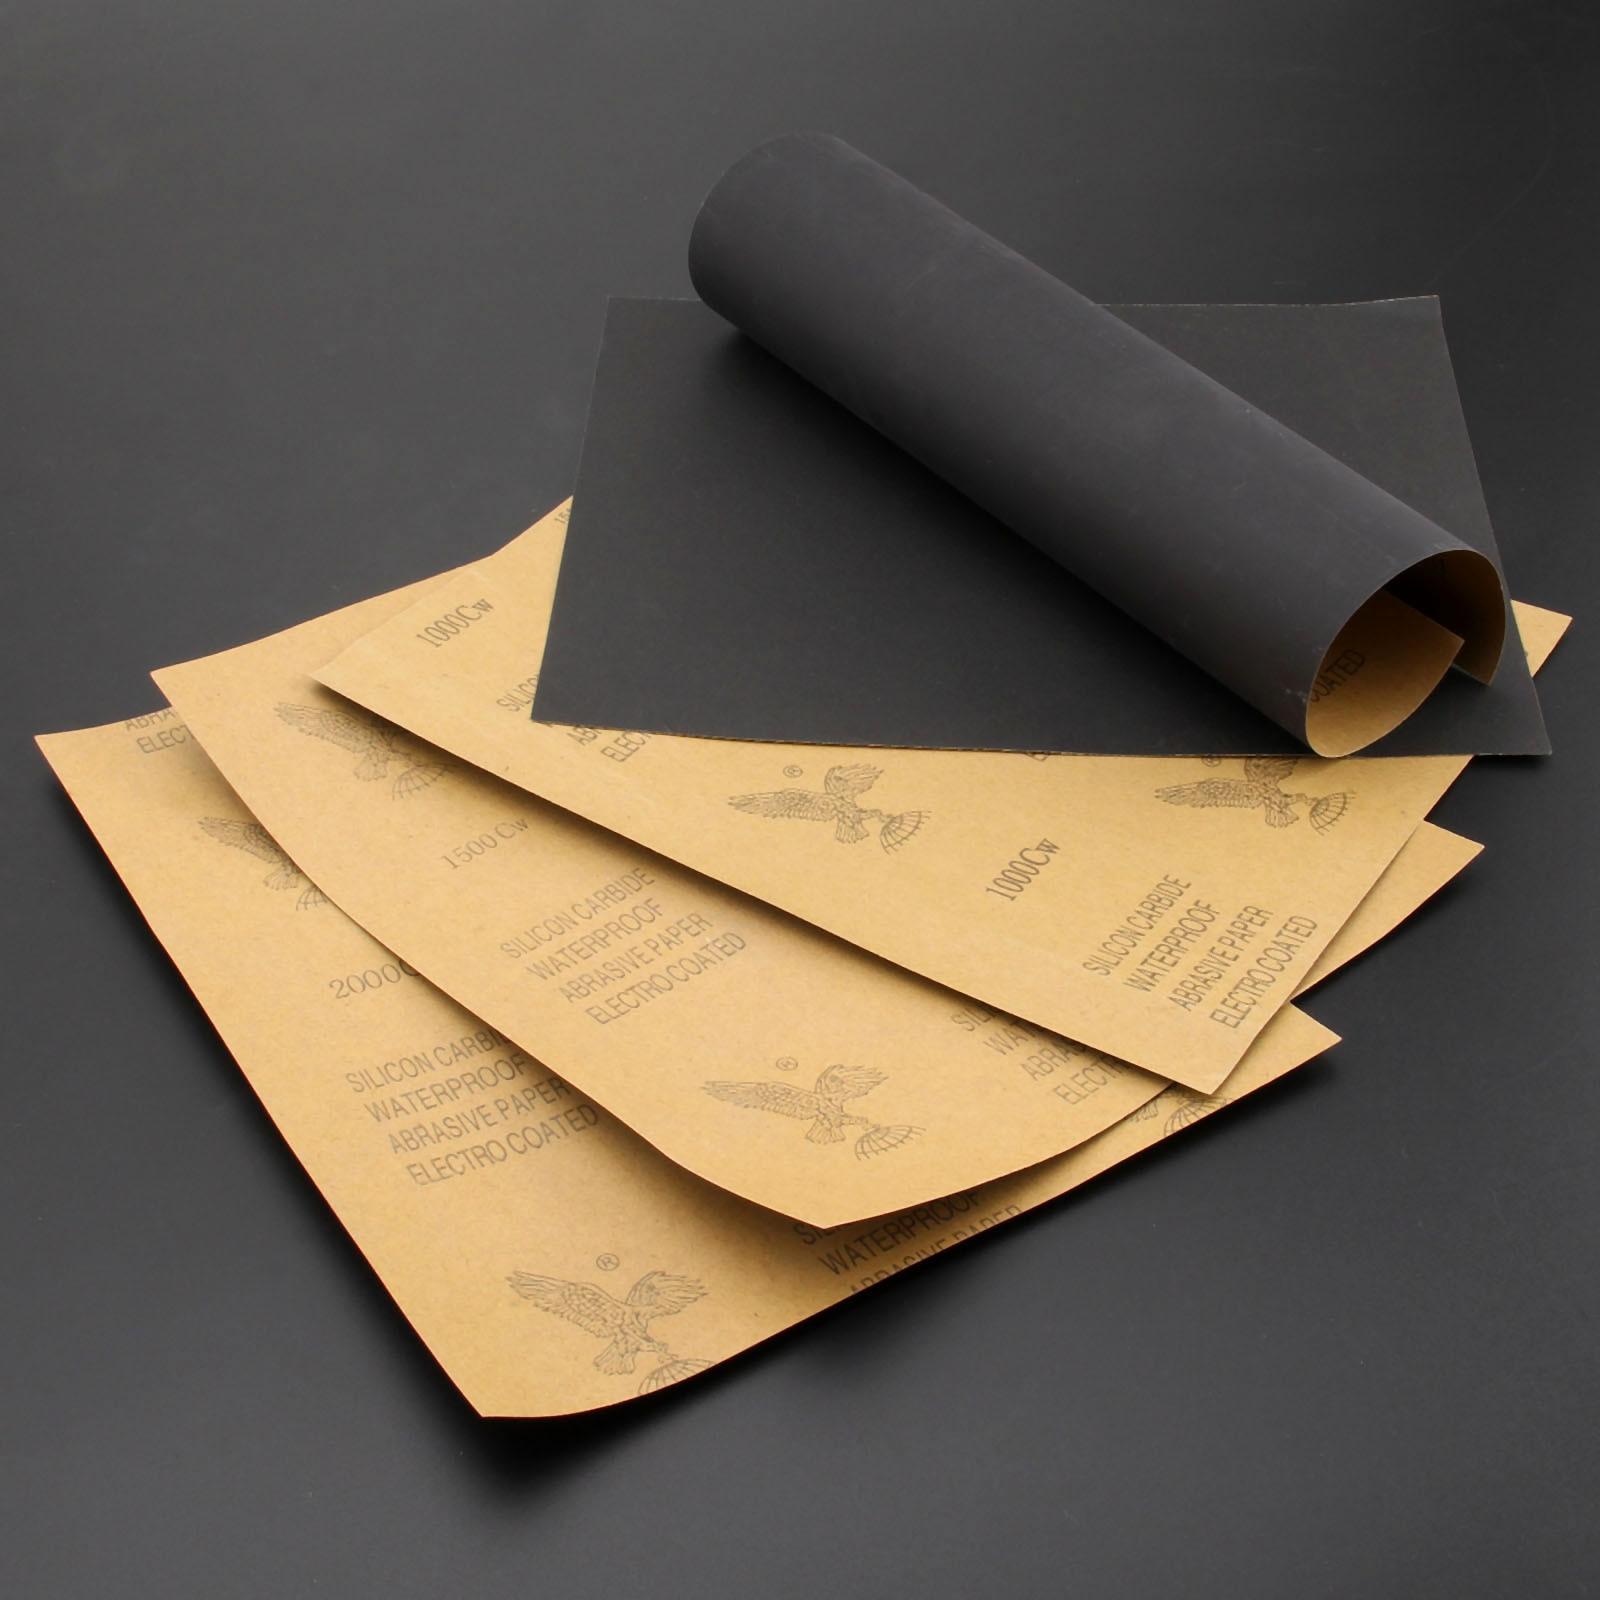 DRELD 5 fogli carta abrasiva impermeabile carta abrasiva carta - Utensili abrasivi - Fotografia 4